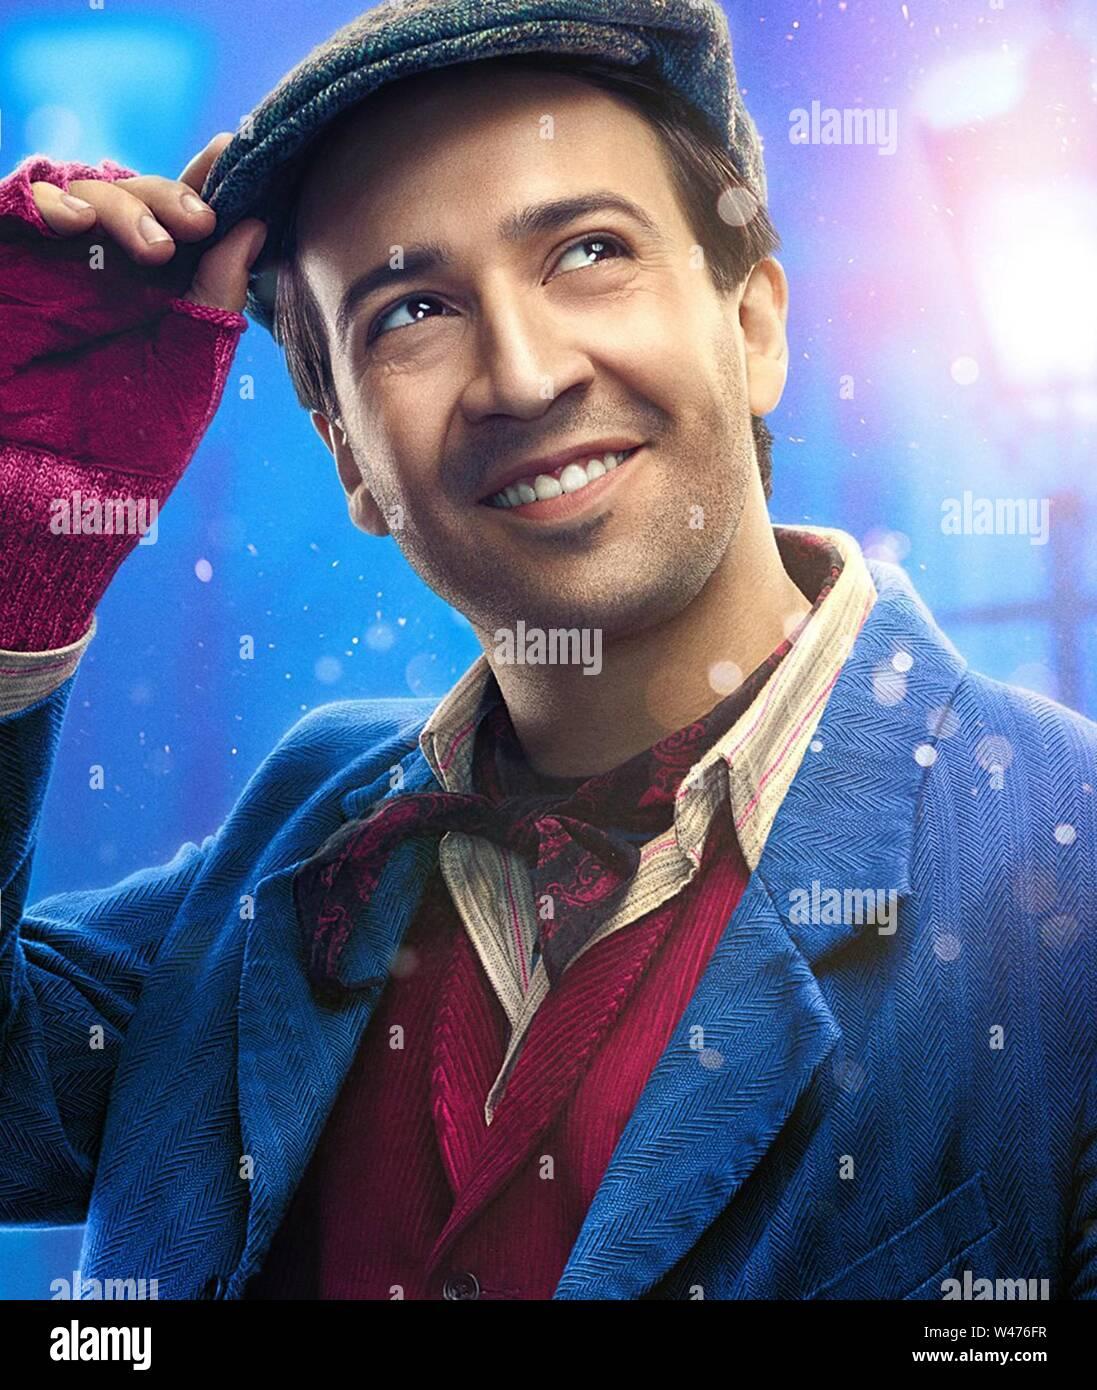 Lin Manuel Miranda In Mary Poppins Returns 2018 Directed By Rob Marshall Credit Lucamar Productions Marc Platt Productions Walt Disney Album Stock Photo Alamy